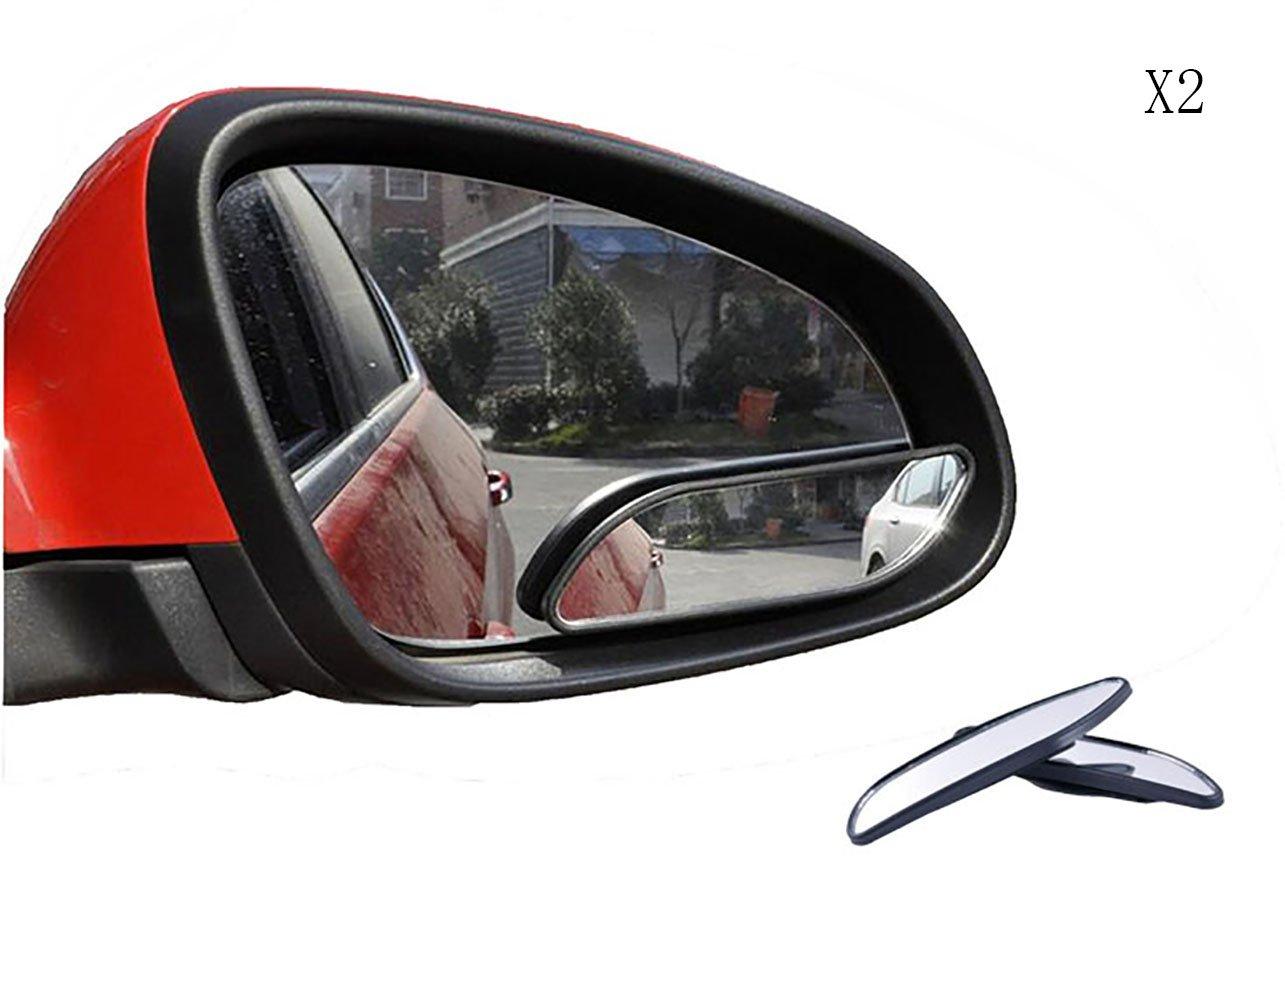 Meipro 360 /° Girar El Espejo De Punto Ciego Gran Angular Espejo Retrovisor Ajustable Espejo De Cristal Convexo De HD Para el Coche SUV Universal Fit Stick On Lens Paquete De 2pcs